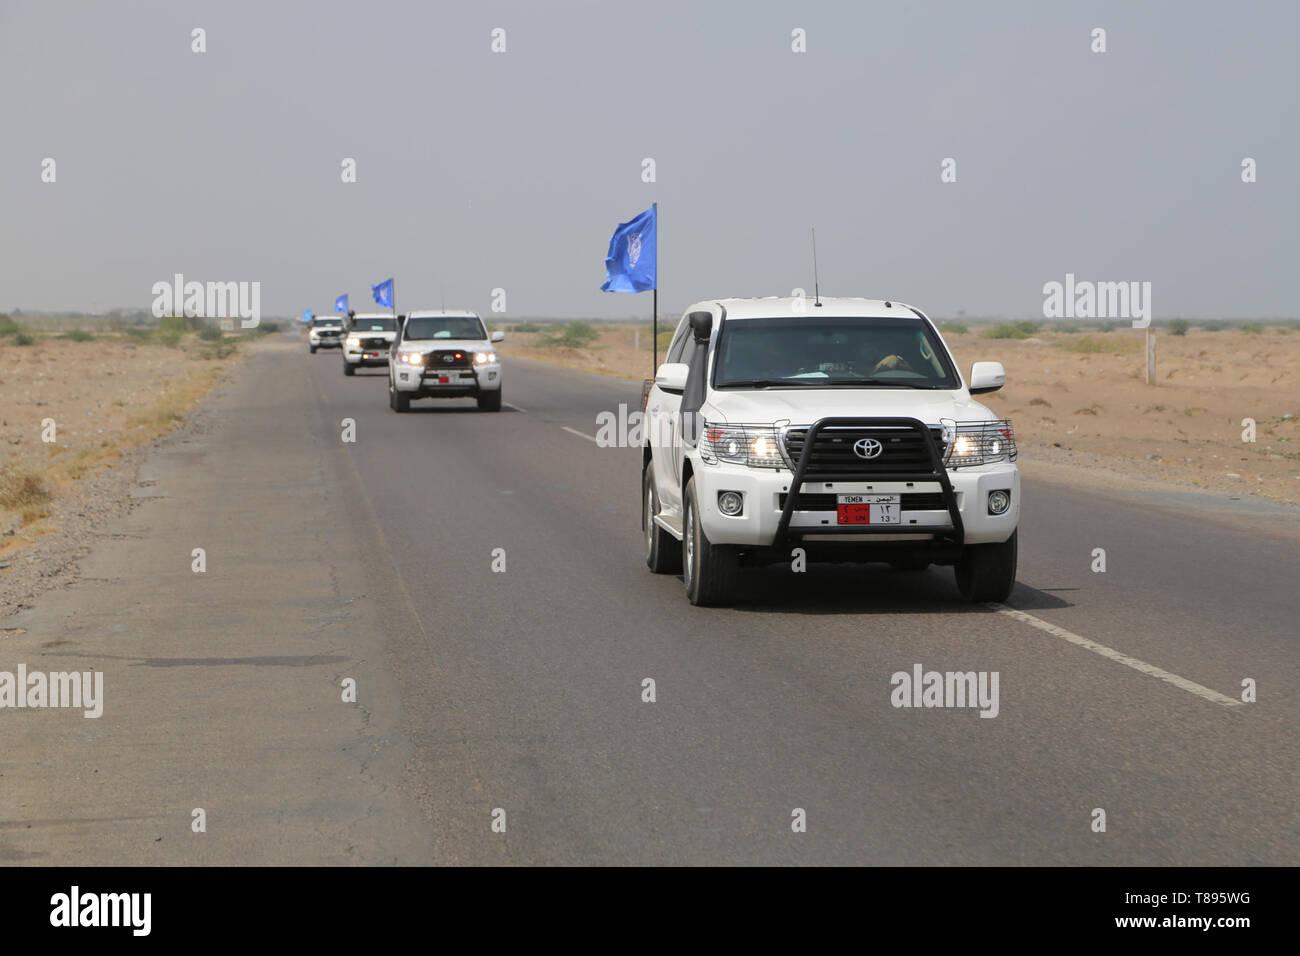 (190511) -- HODEIDAH (YEMEN), May 11, 2019 (Xinhua) -- UN vehicles are seen on their way to Salif port in Hodeidah, Yemen, on May 11, 2019. Yemen's Houthi rebels began on Saturday withdrawal from two ports of Hodeidah Province, eyewitnesses said. (Xinhua) Stock Photo